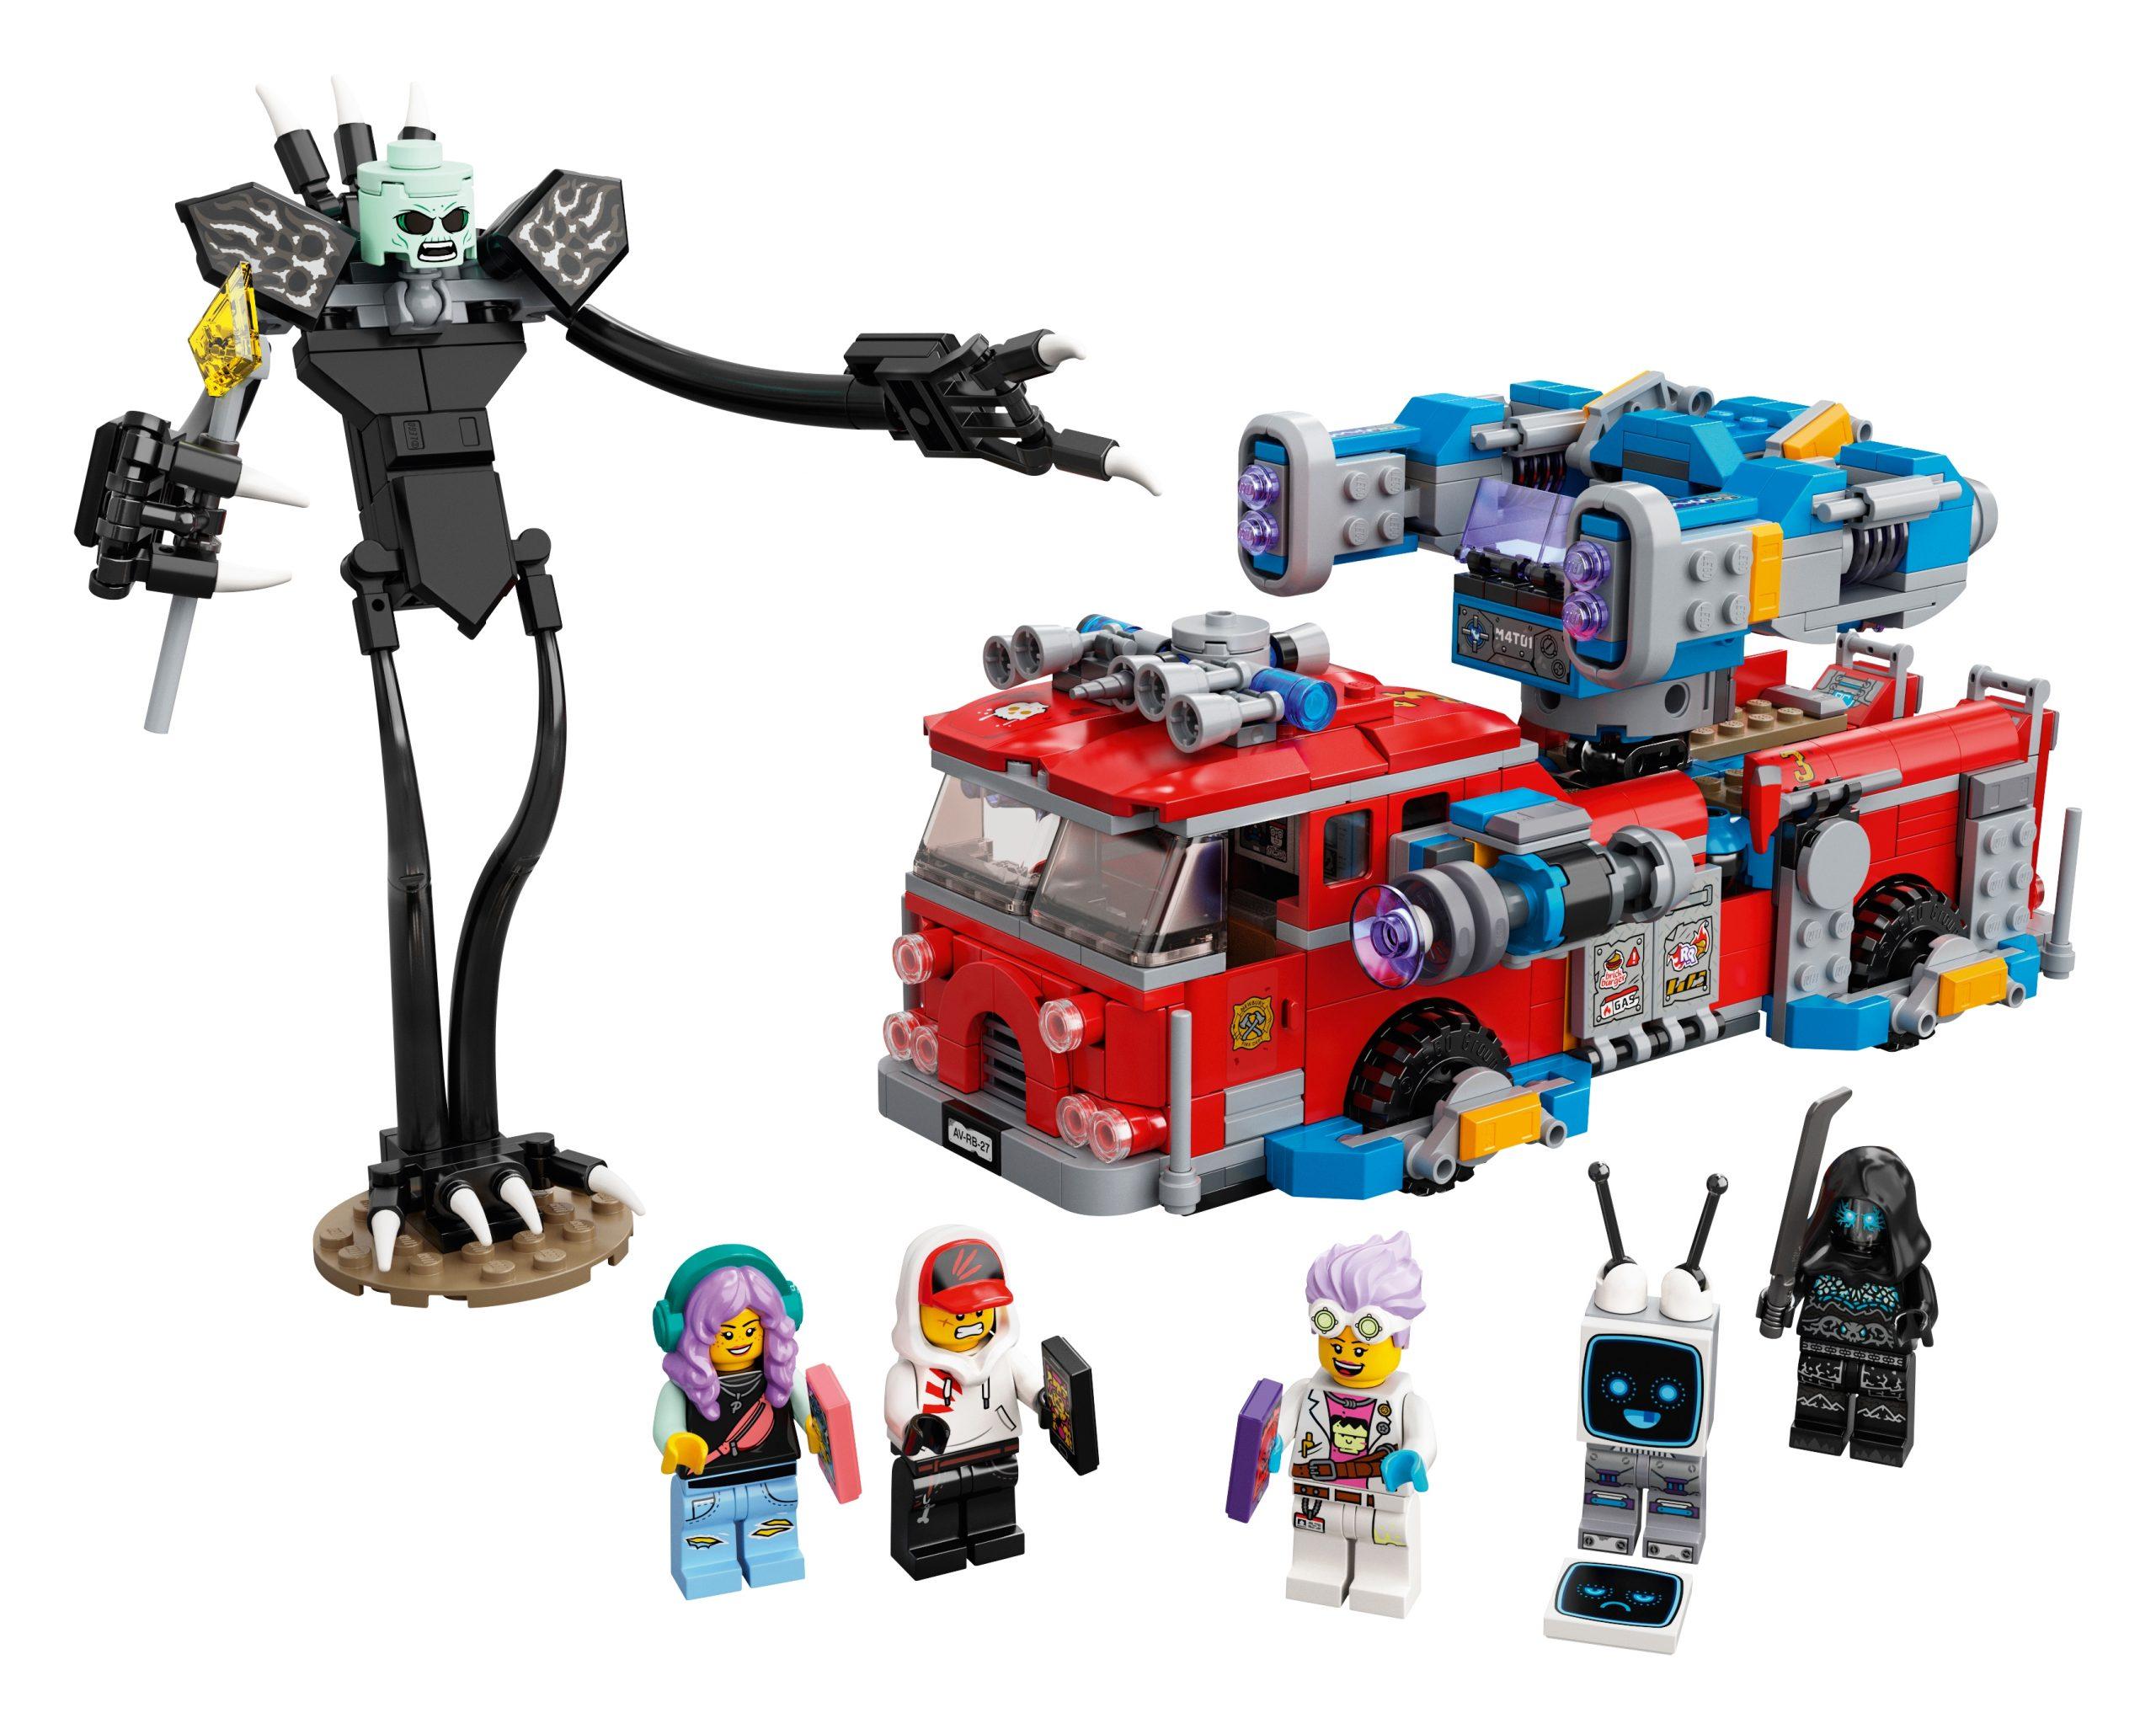 lego spookbrandweerauto 3000 70436 scaled